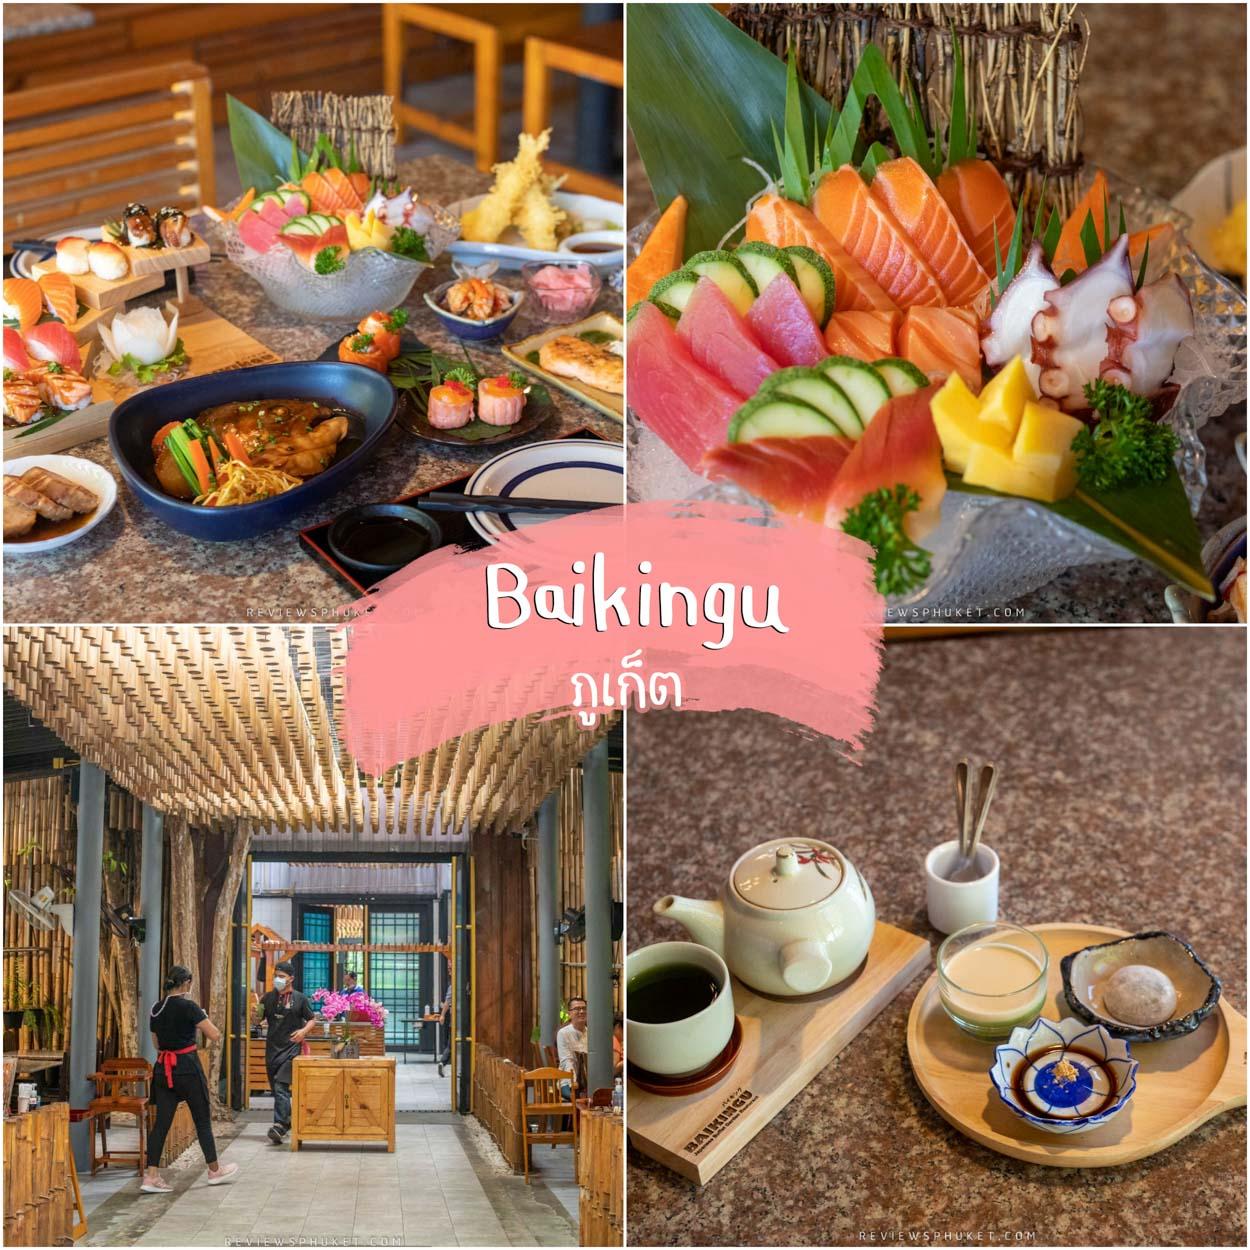 Baikingu บุฟเฟ่ต์ภูเก็ต ที่สุดแห่งบุฟเฟ่ต์อาหารญี่ปุ่น จุดเด่นเลยคือวัตถุดิบดี ราคาถูก ของดีของครบ หัวปลาต้มซีอิ๊วคือเบสมาก